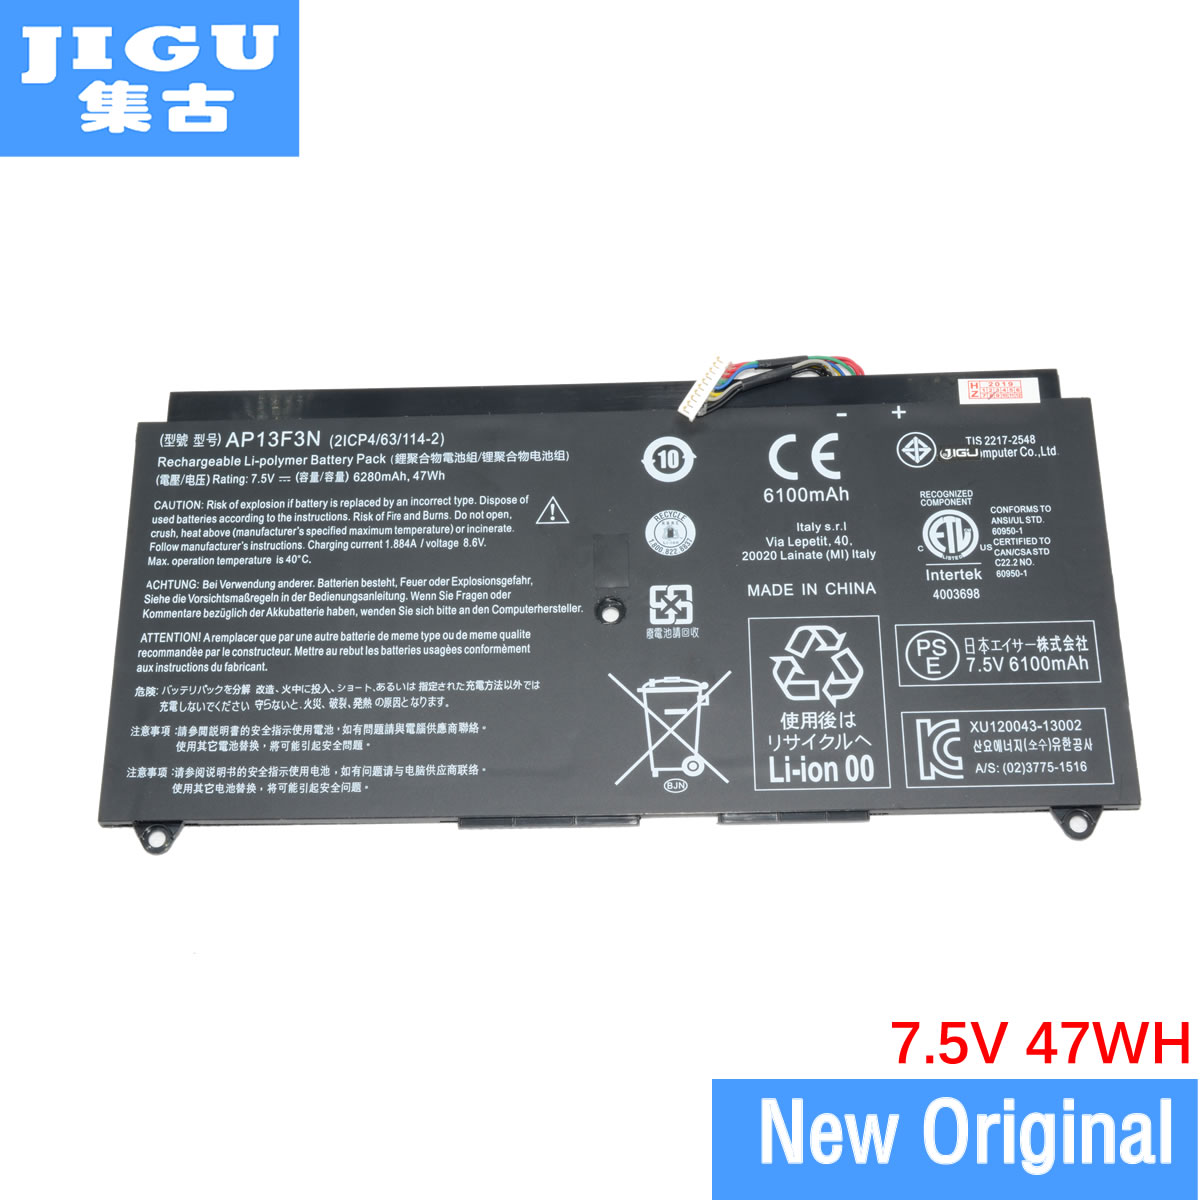 Jgu-batería Original para ordenador portátil, 2ICP4/63/114-2 AP13F3N para ACER, Aspire S7-392, S7-393,...